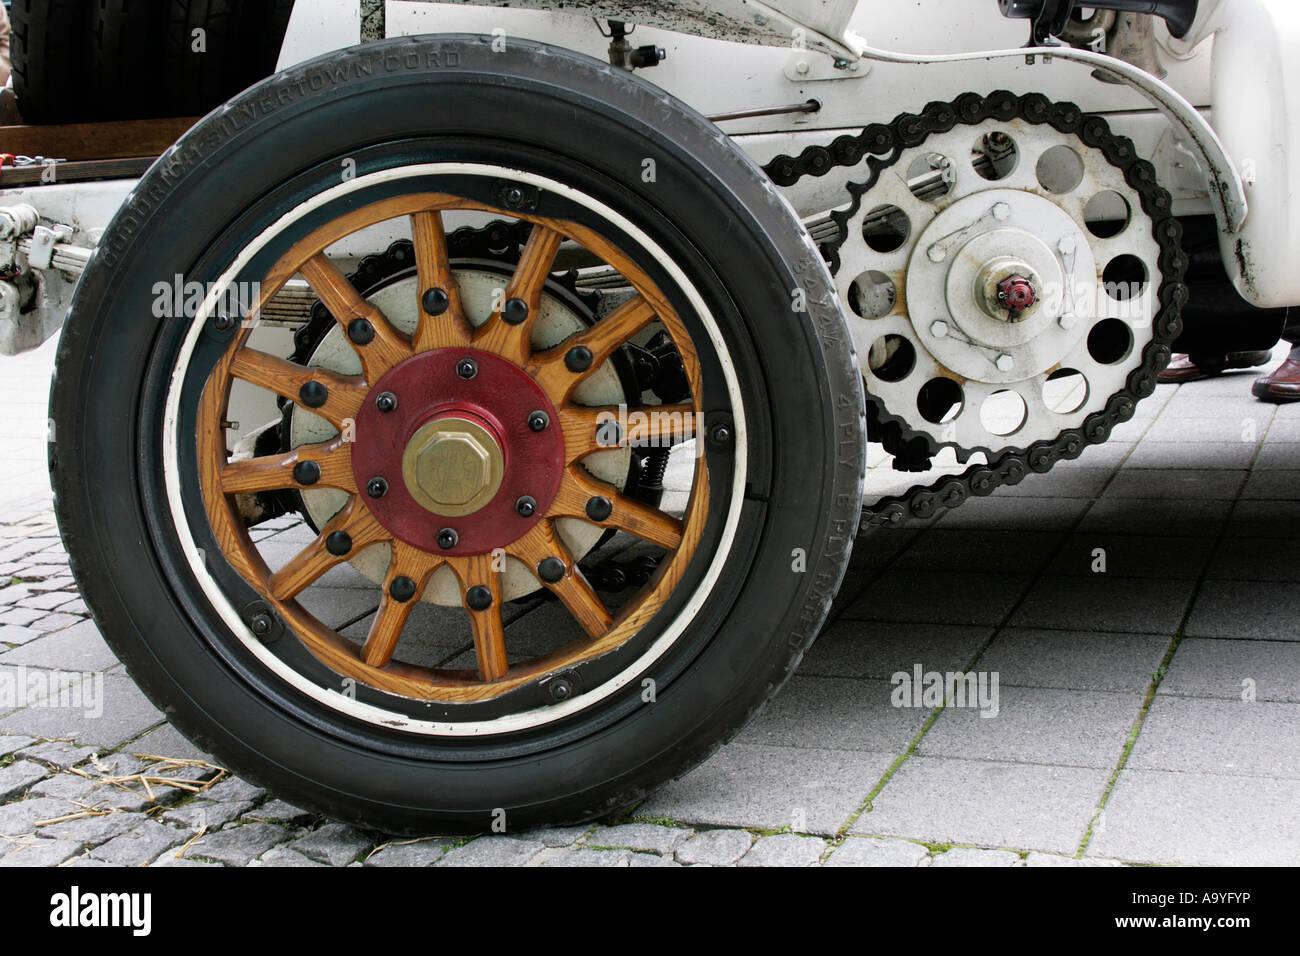 Vintage car Mercedes Simplex 28 / 32 of 1904, Wooden spokes wheel ...